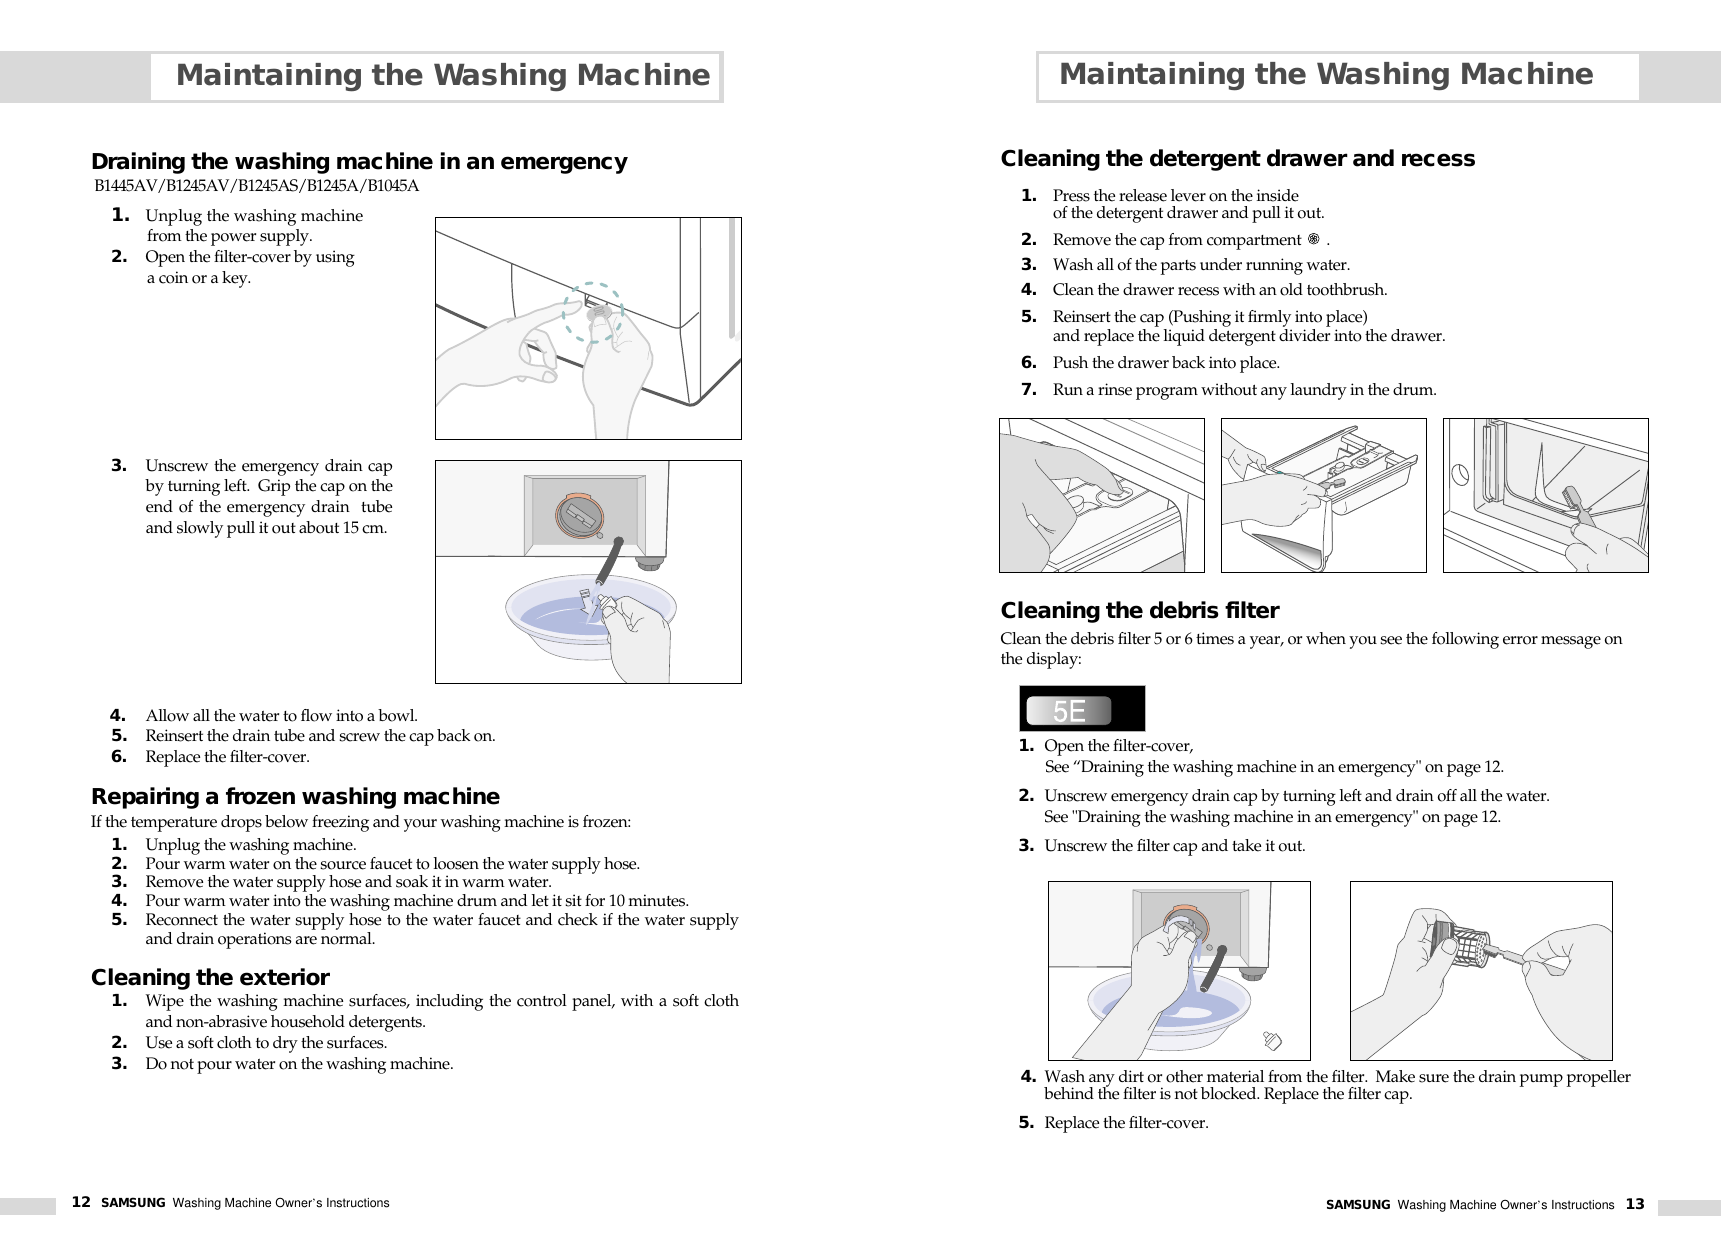 Samsung B1045a Users Manual B1445av 01986j Gb 1125